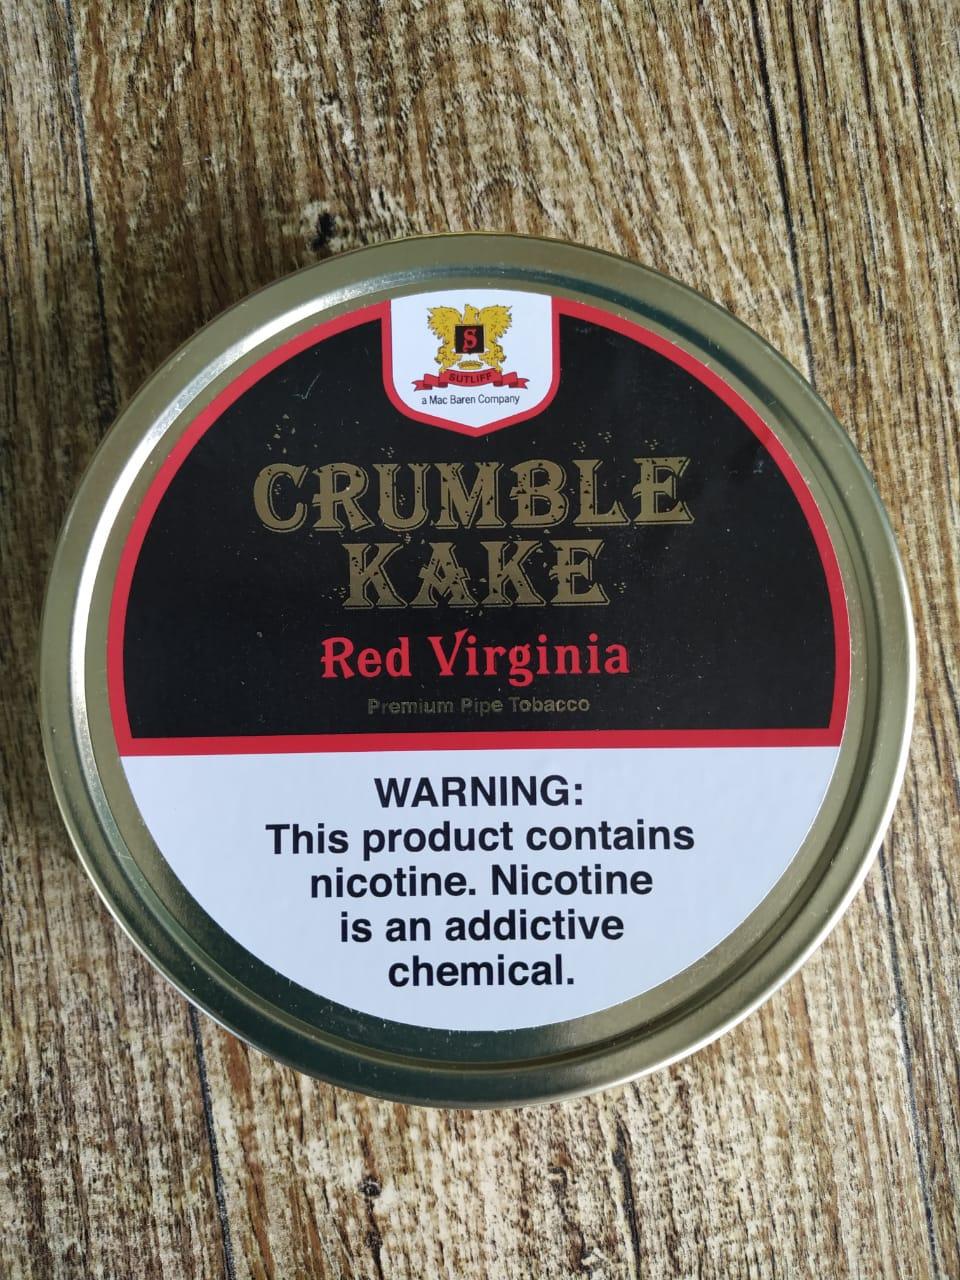 Sutliff Tobacco Company - Crumble Kake Red Virginia